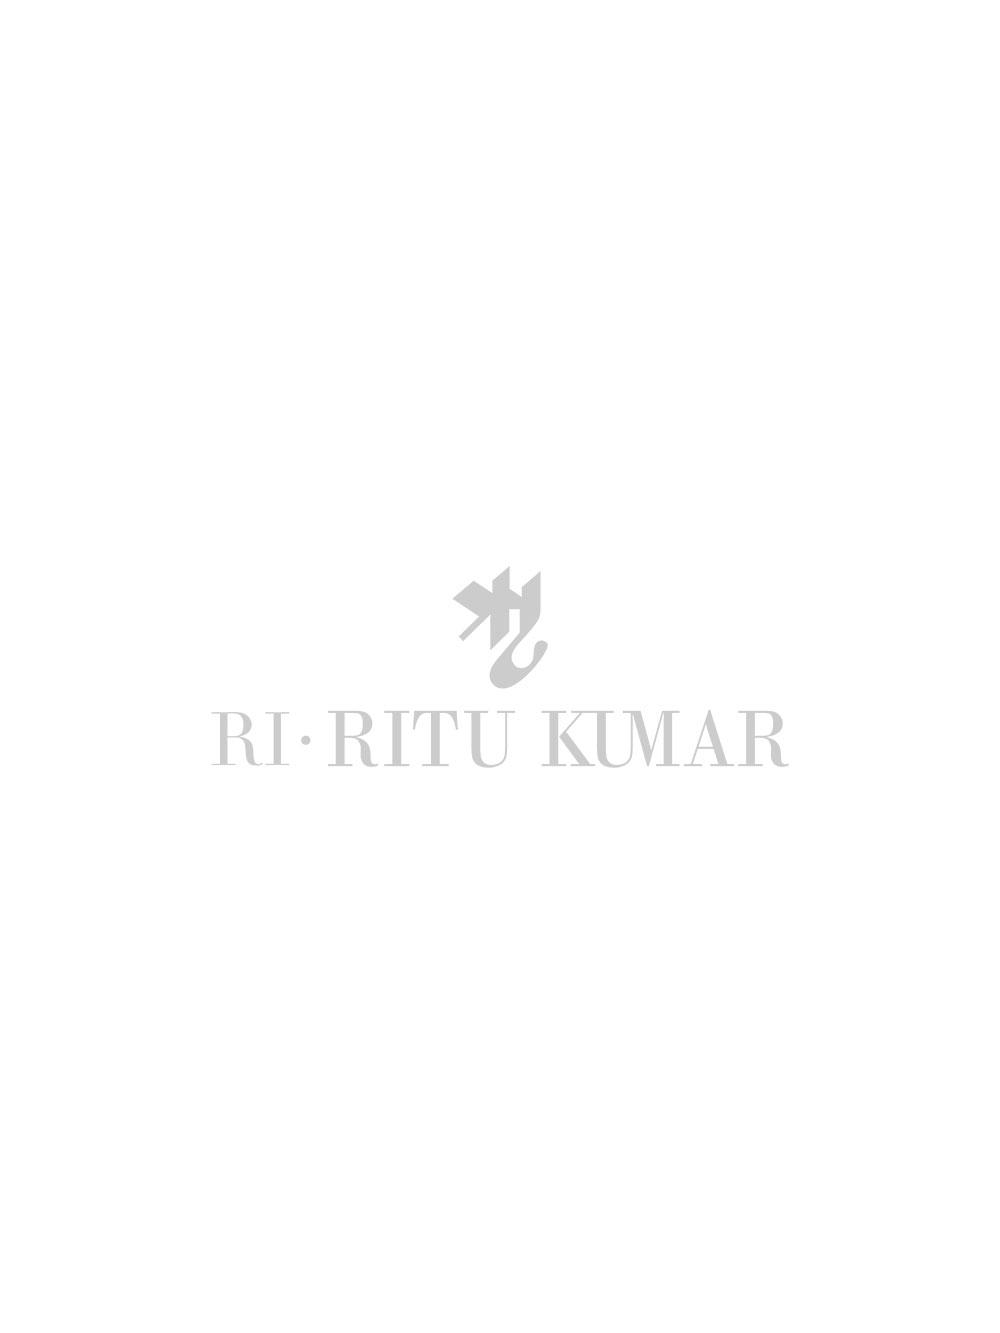 Embroidered Kurta With Gharara By Ritu Kumar